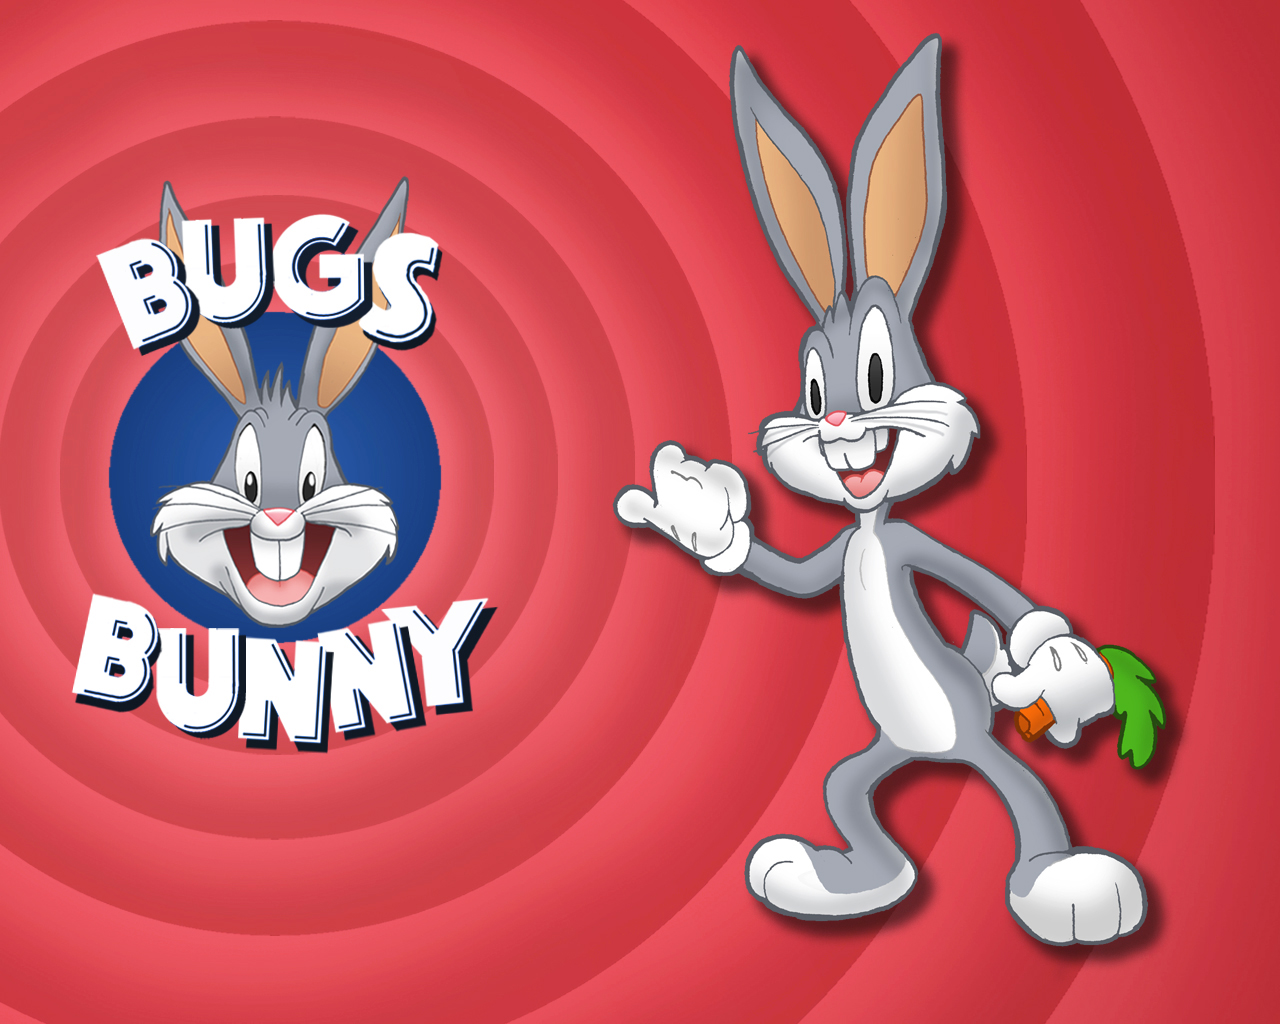 bugs bunny wallpaper 19447